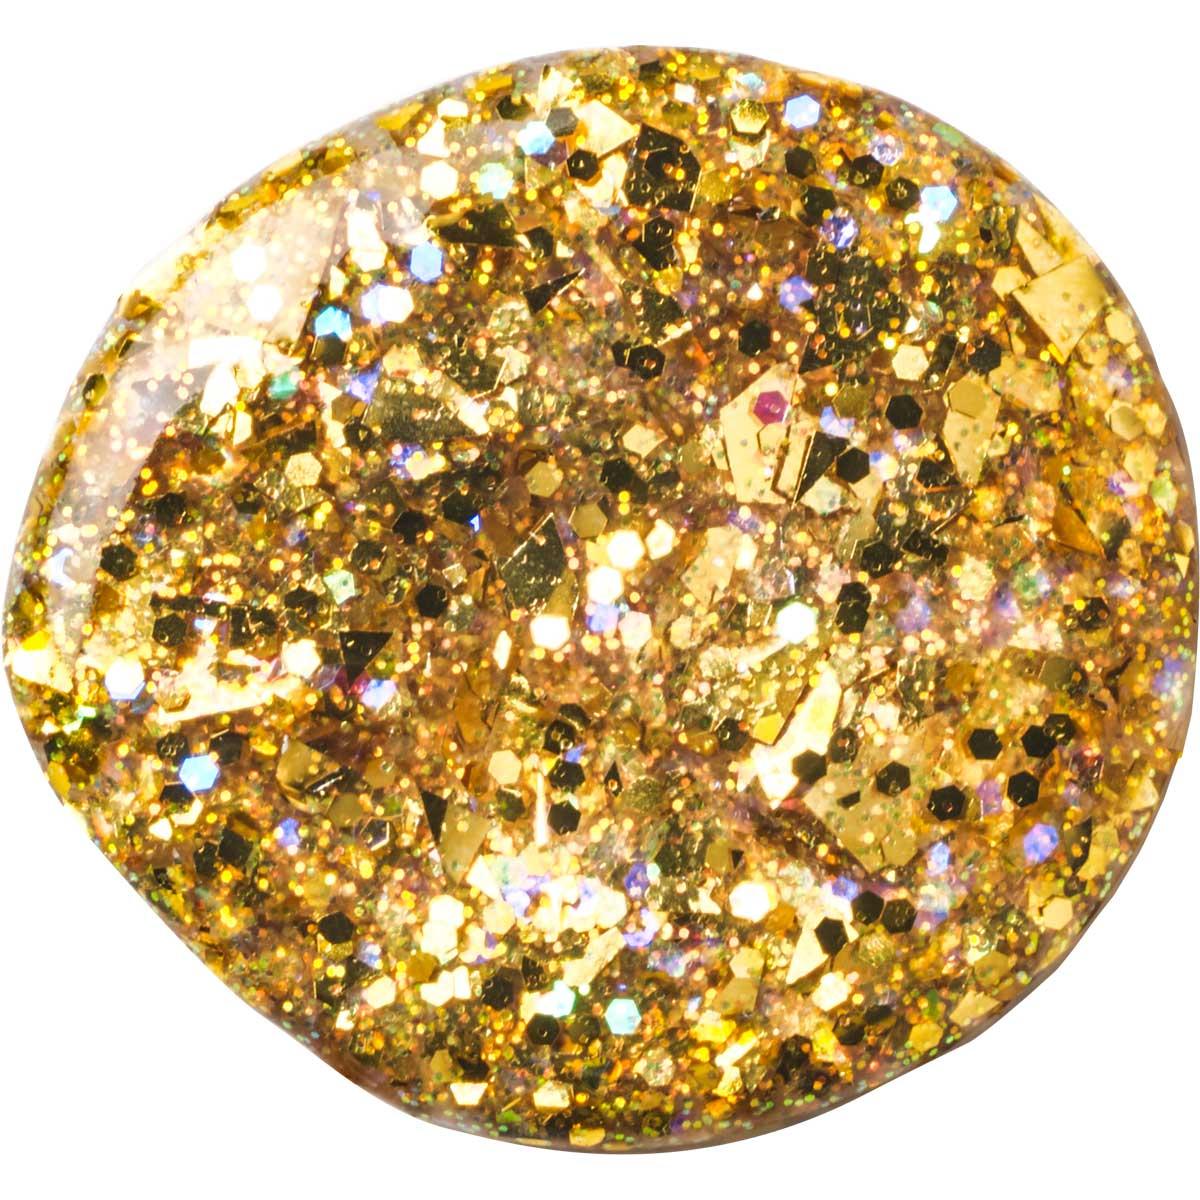 FolkArt ® Glitterific™ Acrylic Paint - Gold, 2 oz.